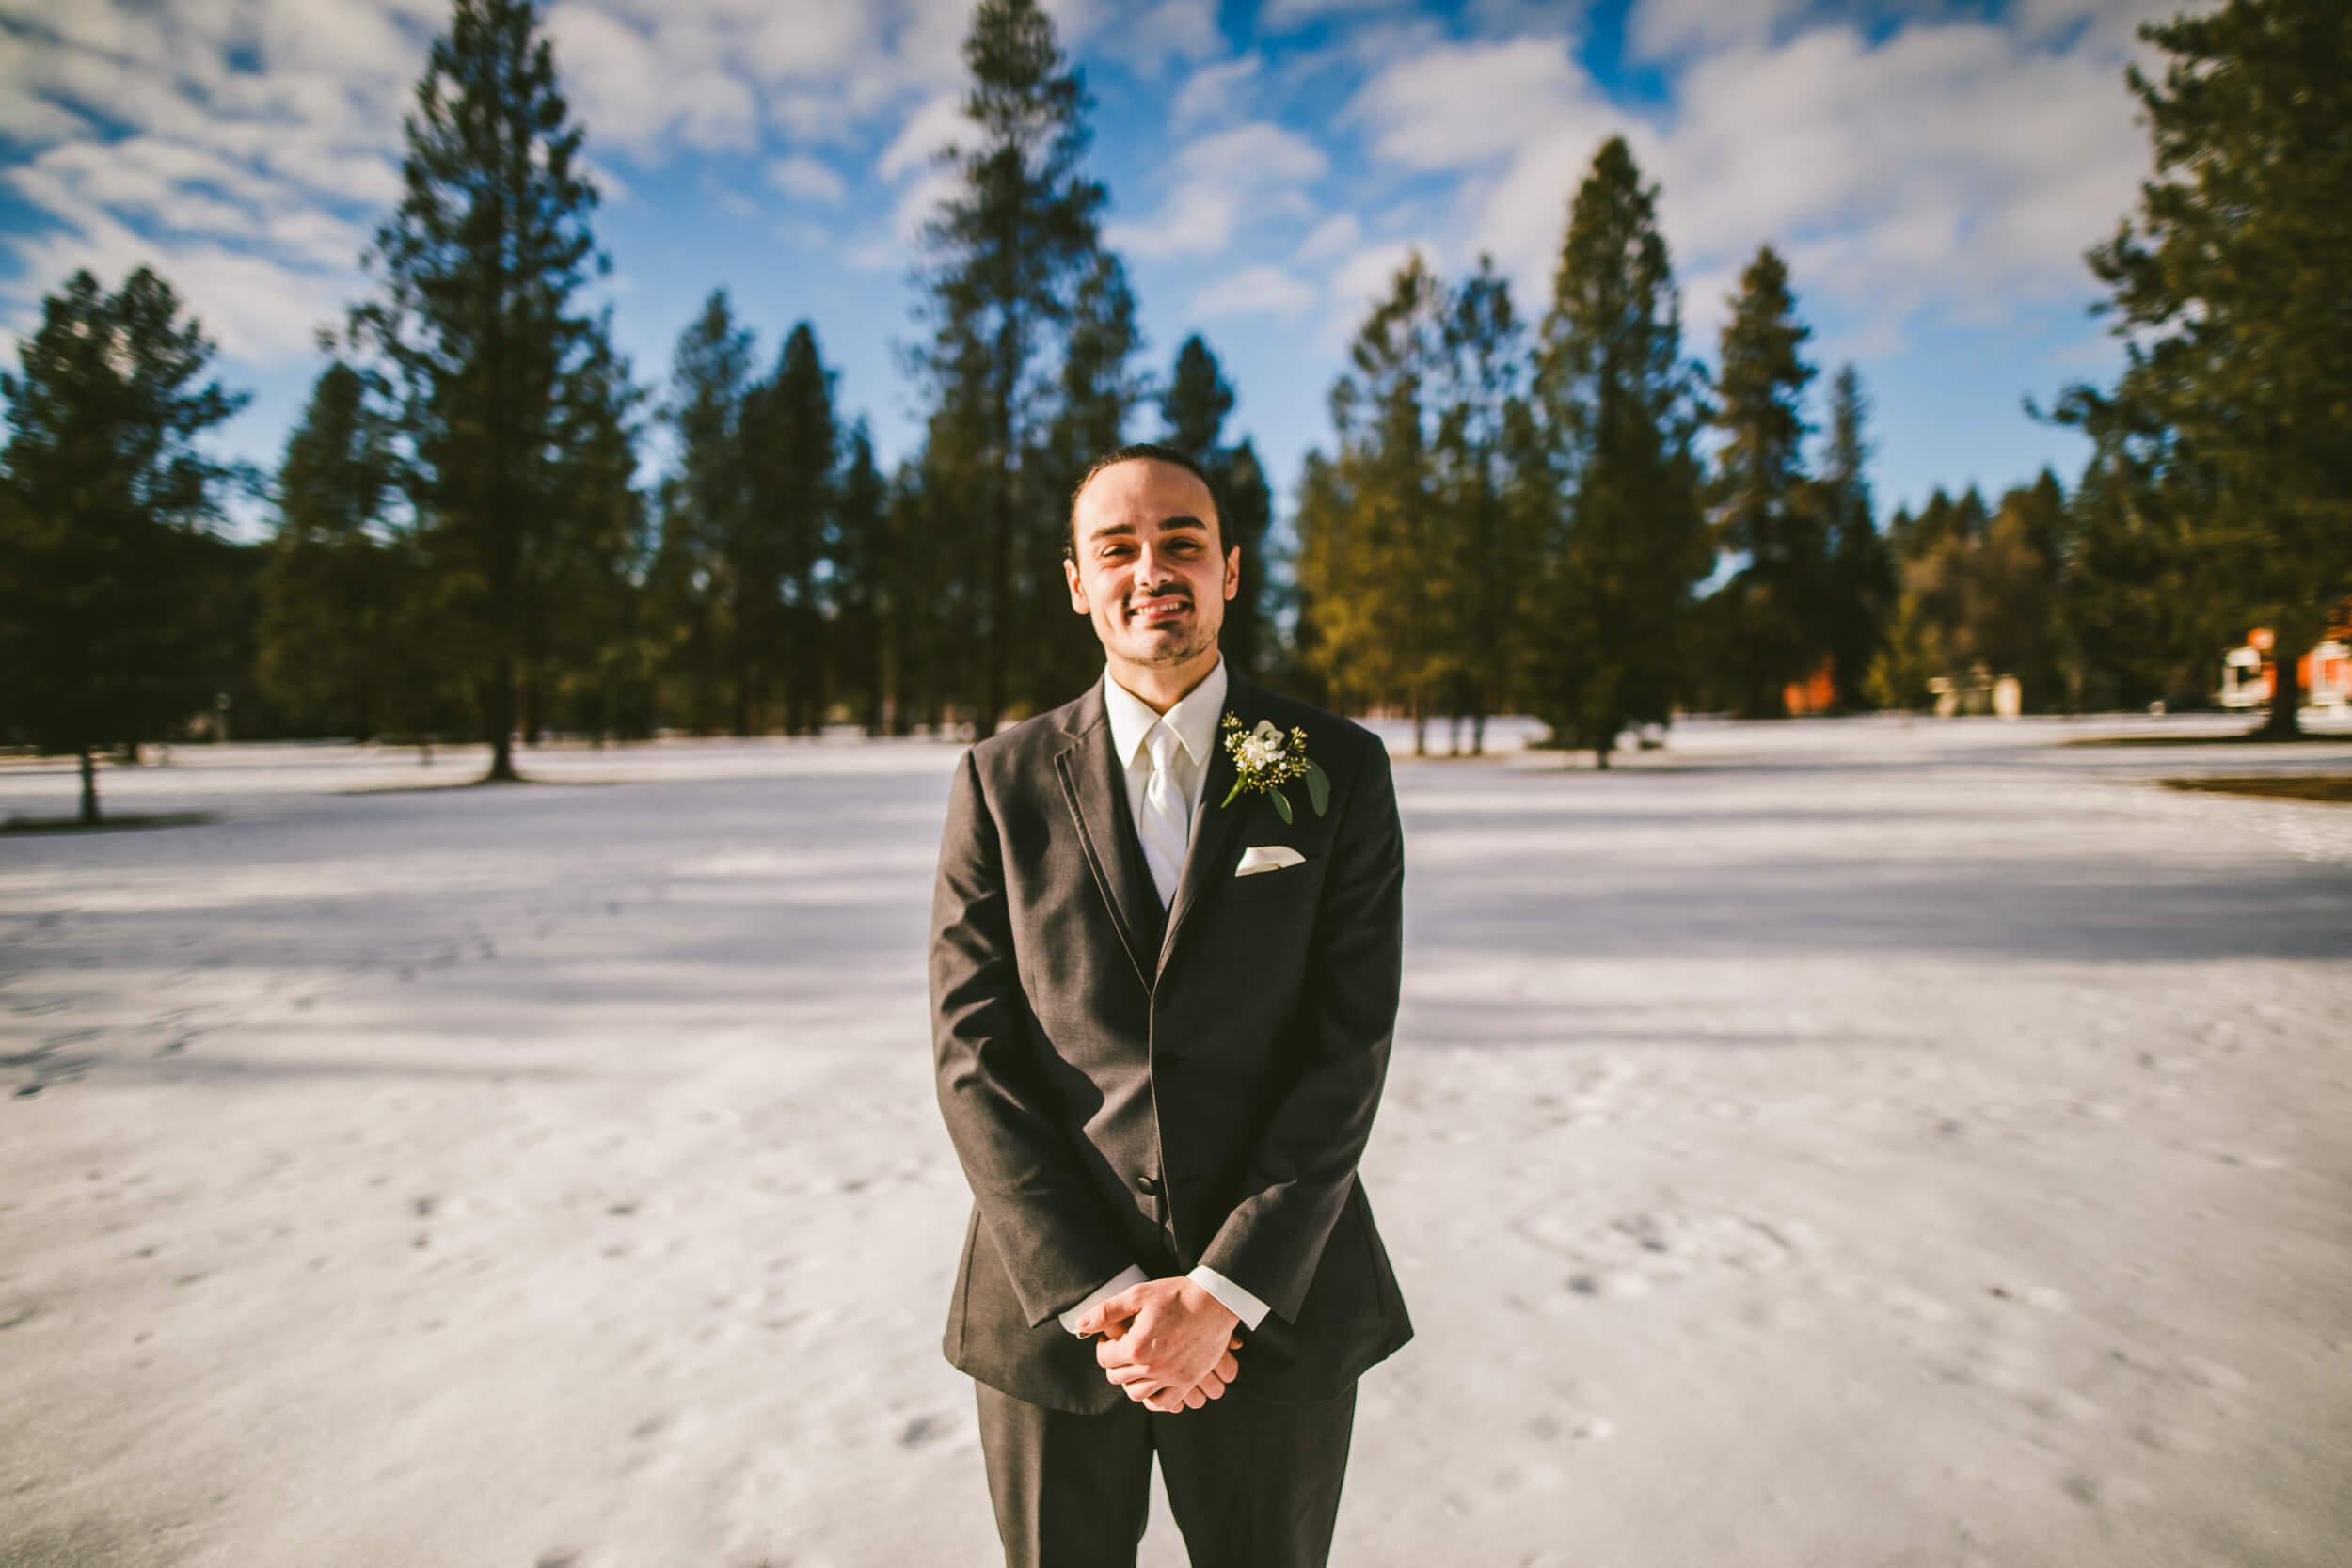 mukogawa winter wedding in spokane (123).jpg